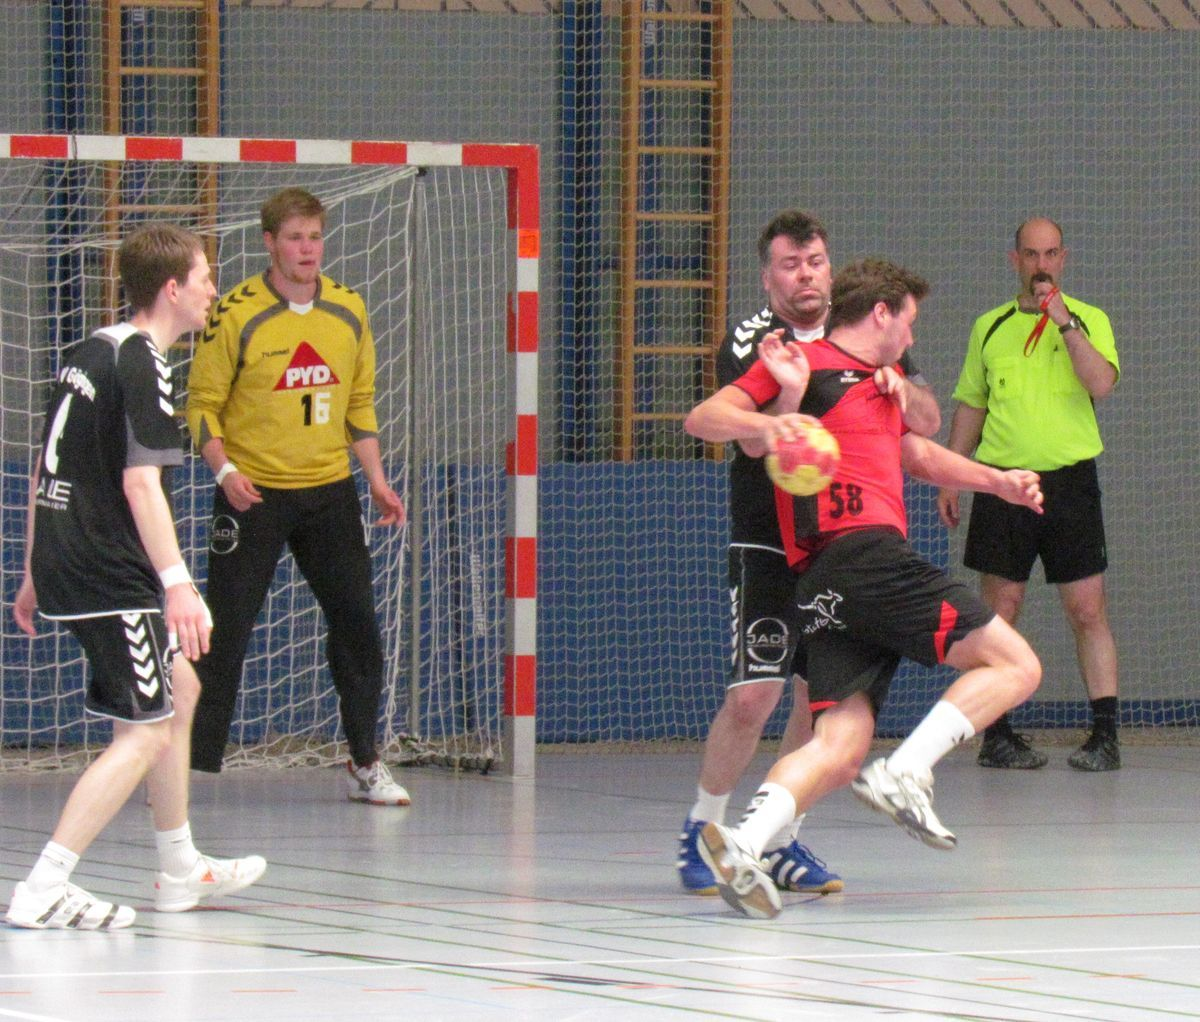 2014-05-10-14.09.59-handball_bhv_quali_03 Handball |Schwabmünchen gewinnt Pokalqualifikationsturnier in Neusäß Handball News News Sport BHV-Pokal Handball TSV Dinkelscherben TSV Gersthofen TSV Neusäß TSV Schwabmünchen |Presse Augsburg